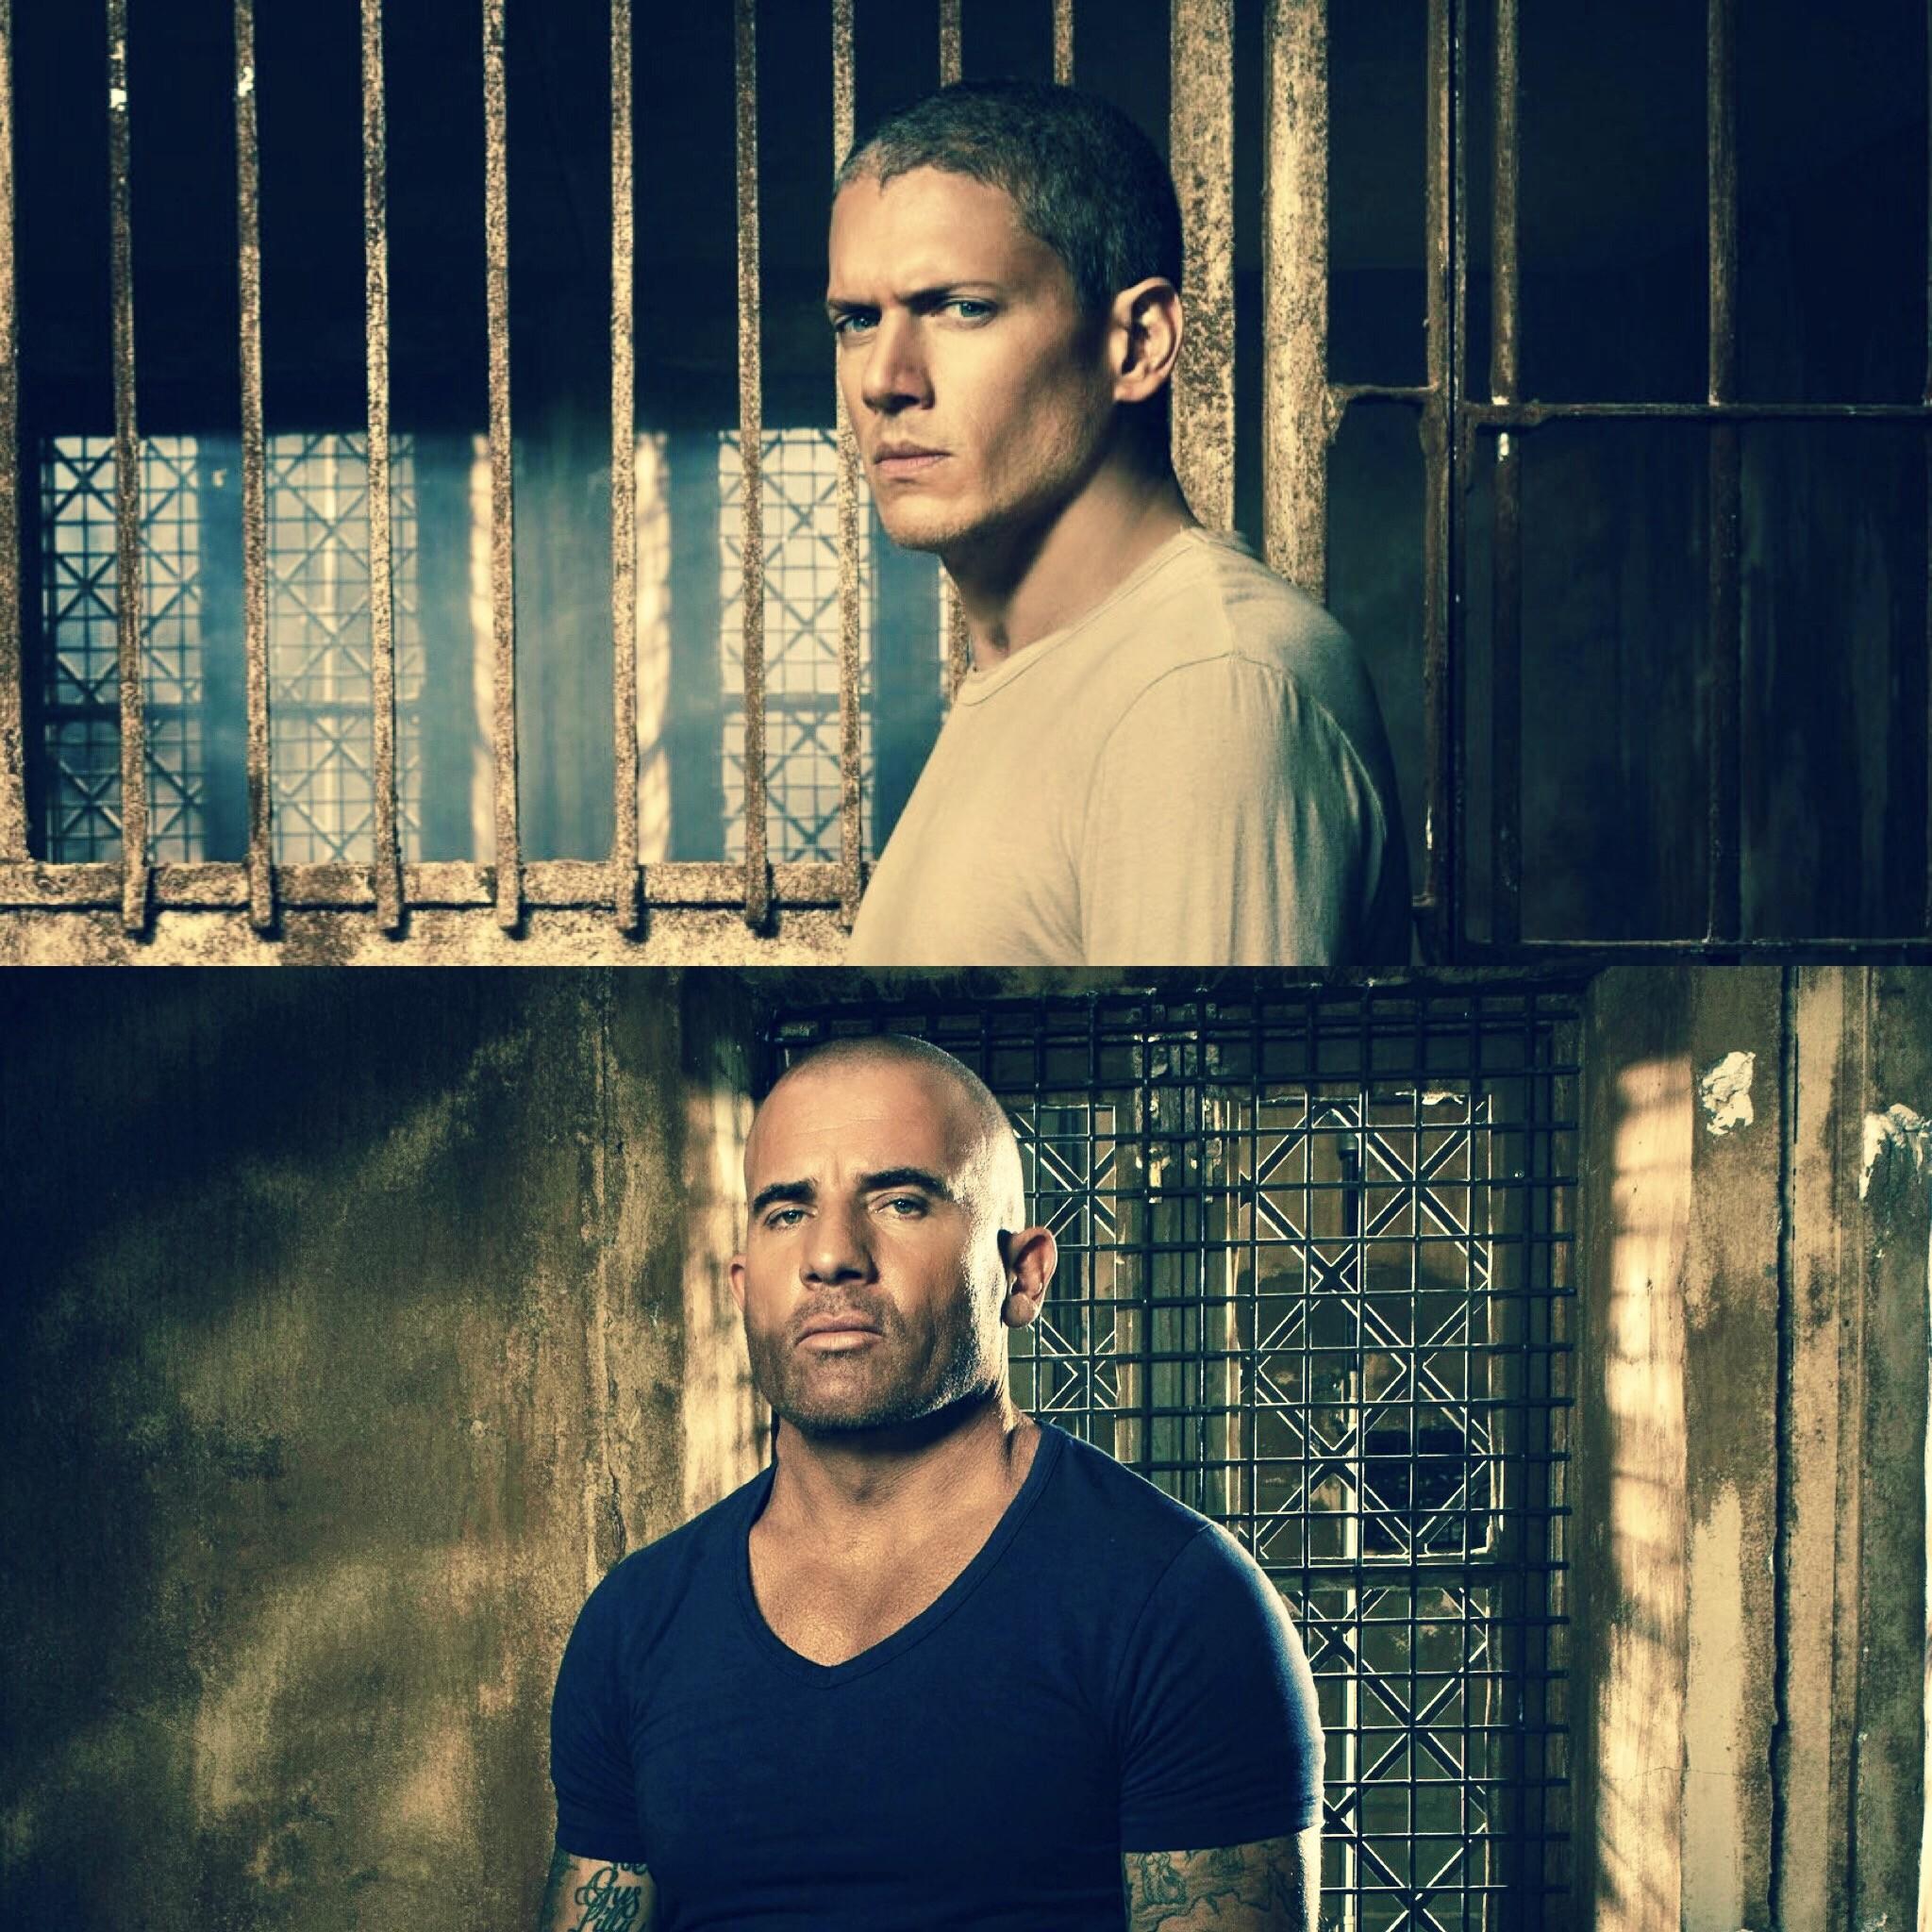 Prison Break Season 4 Wallpaper (56+ images)